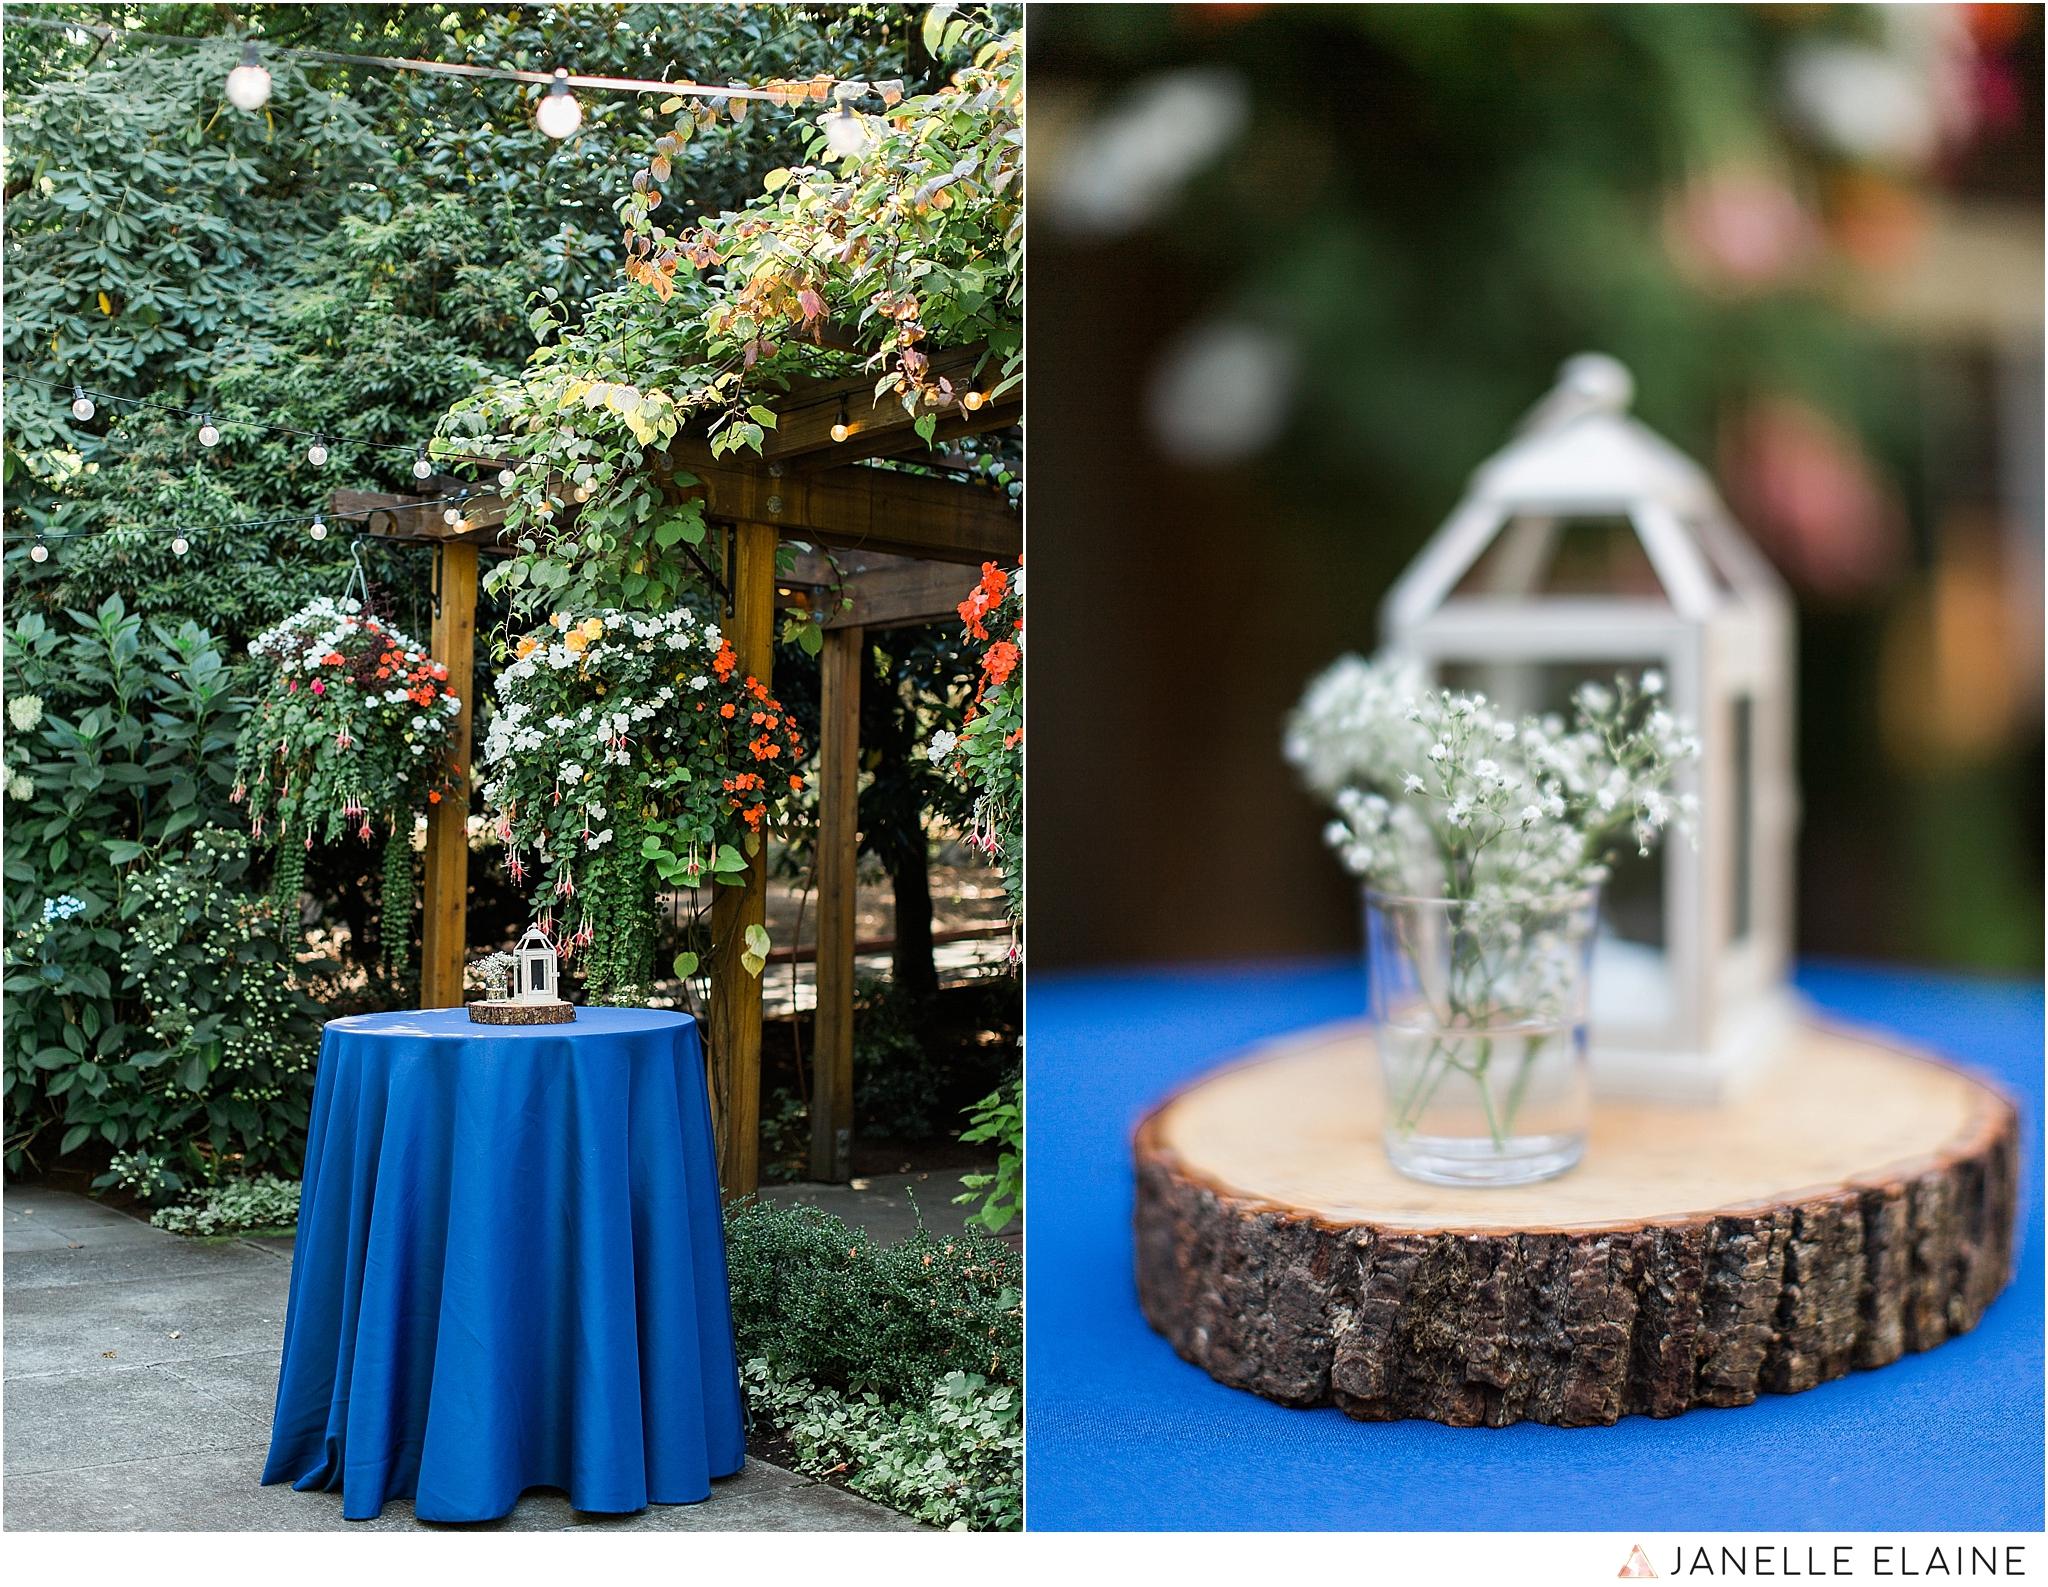 janelle elaine photography-professional wedding photographer-seattle-bellevue-robinswood house-21.jpg